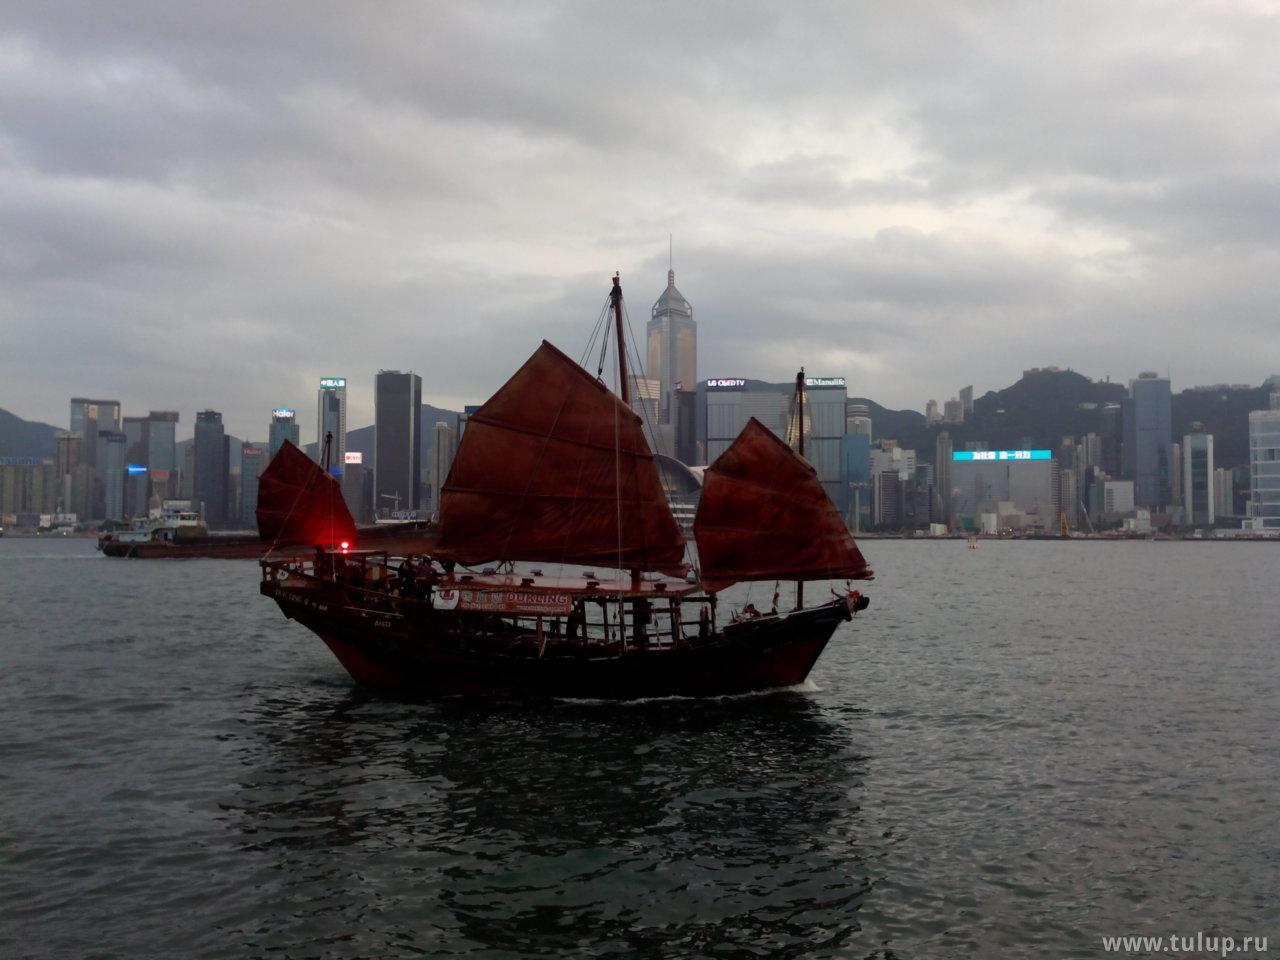 Лодка в традиционном вьетнамском стиле